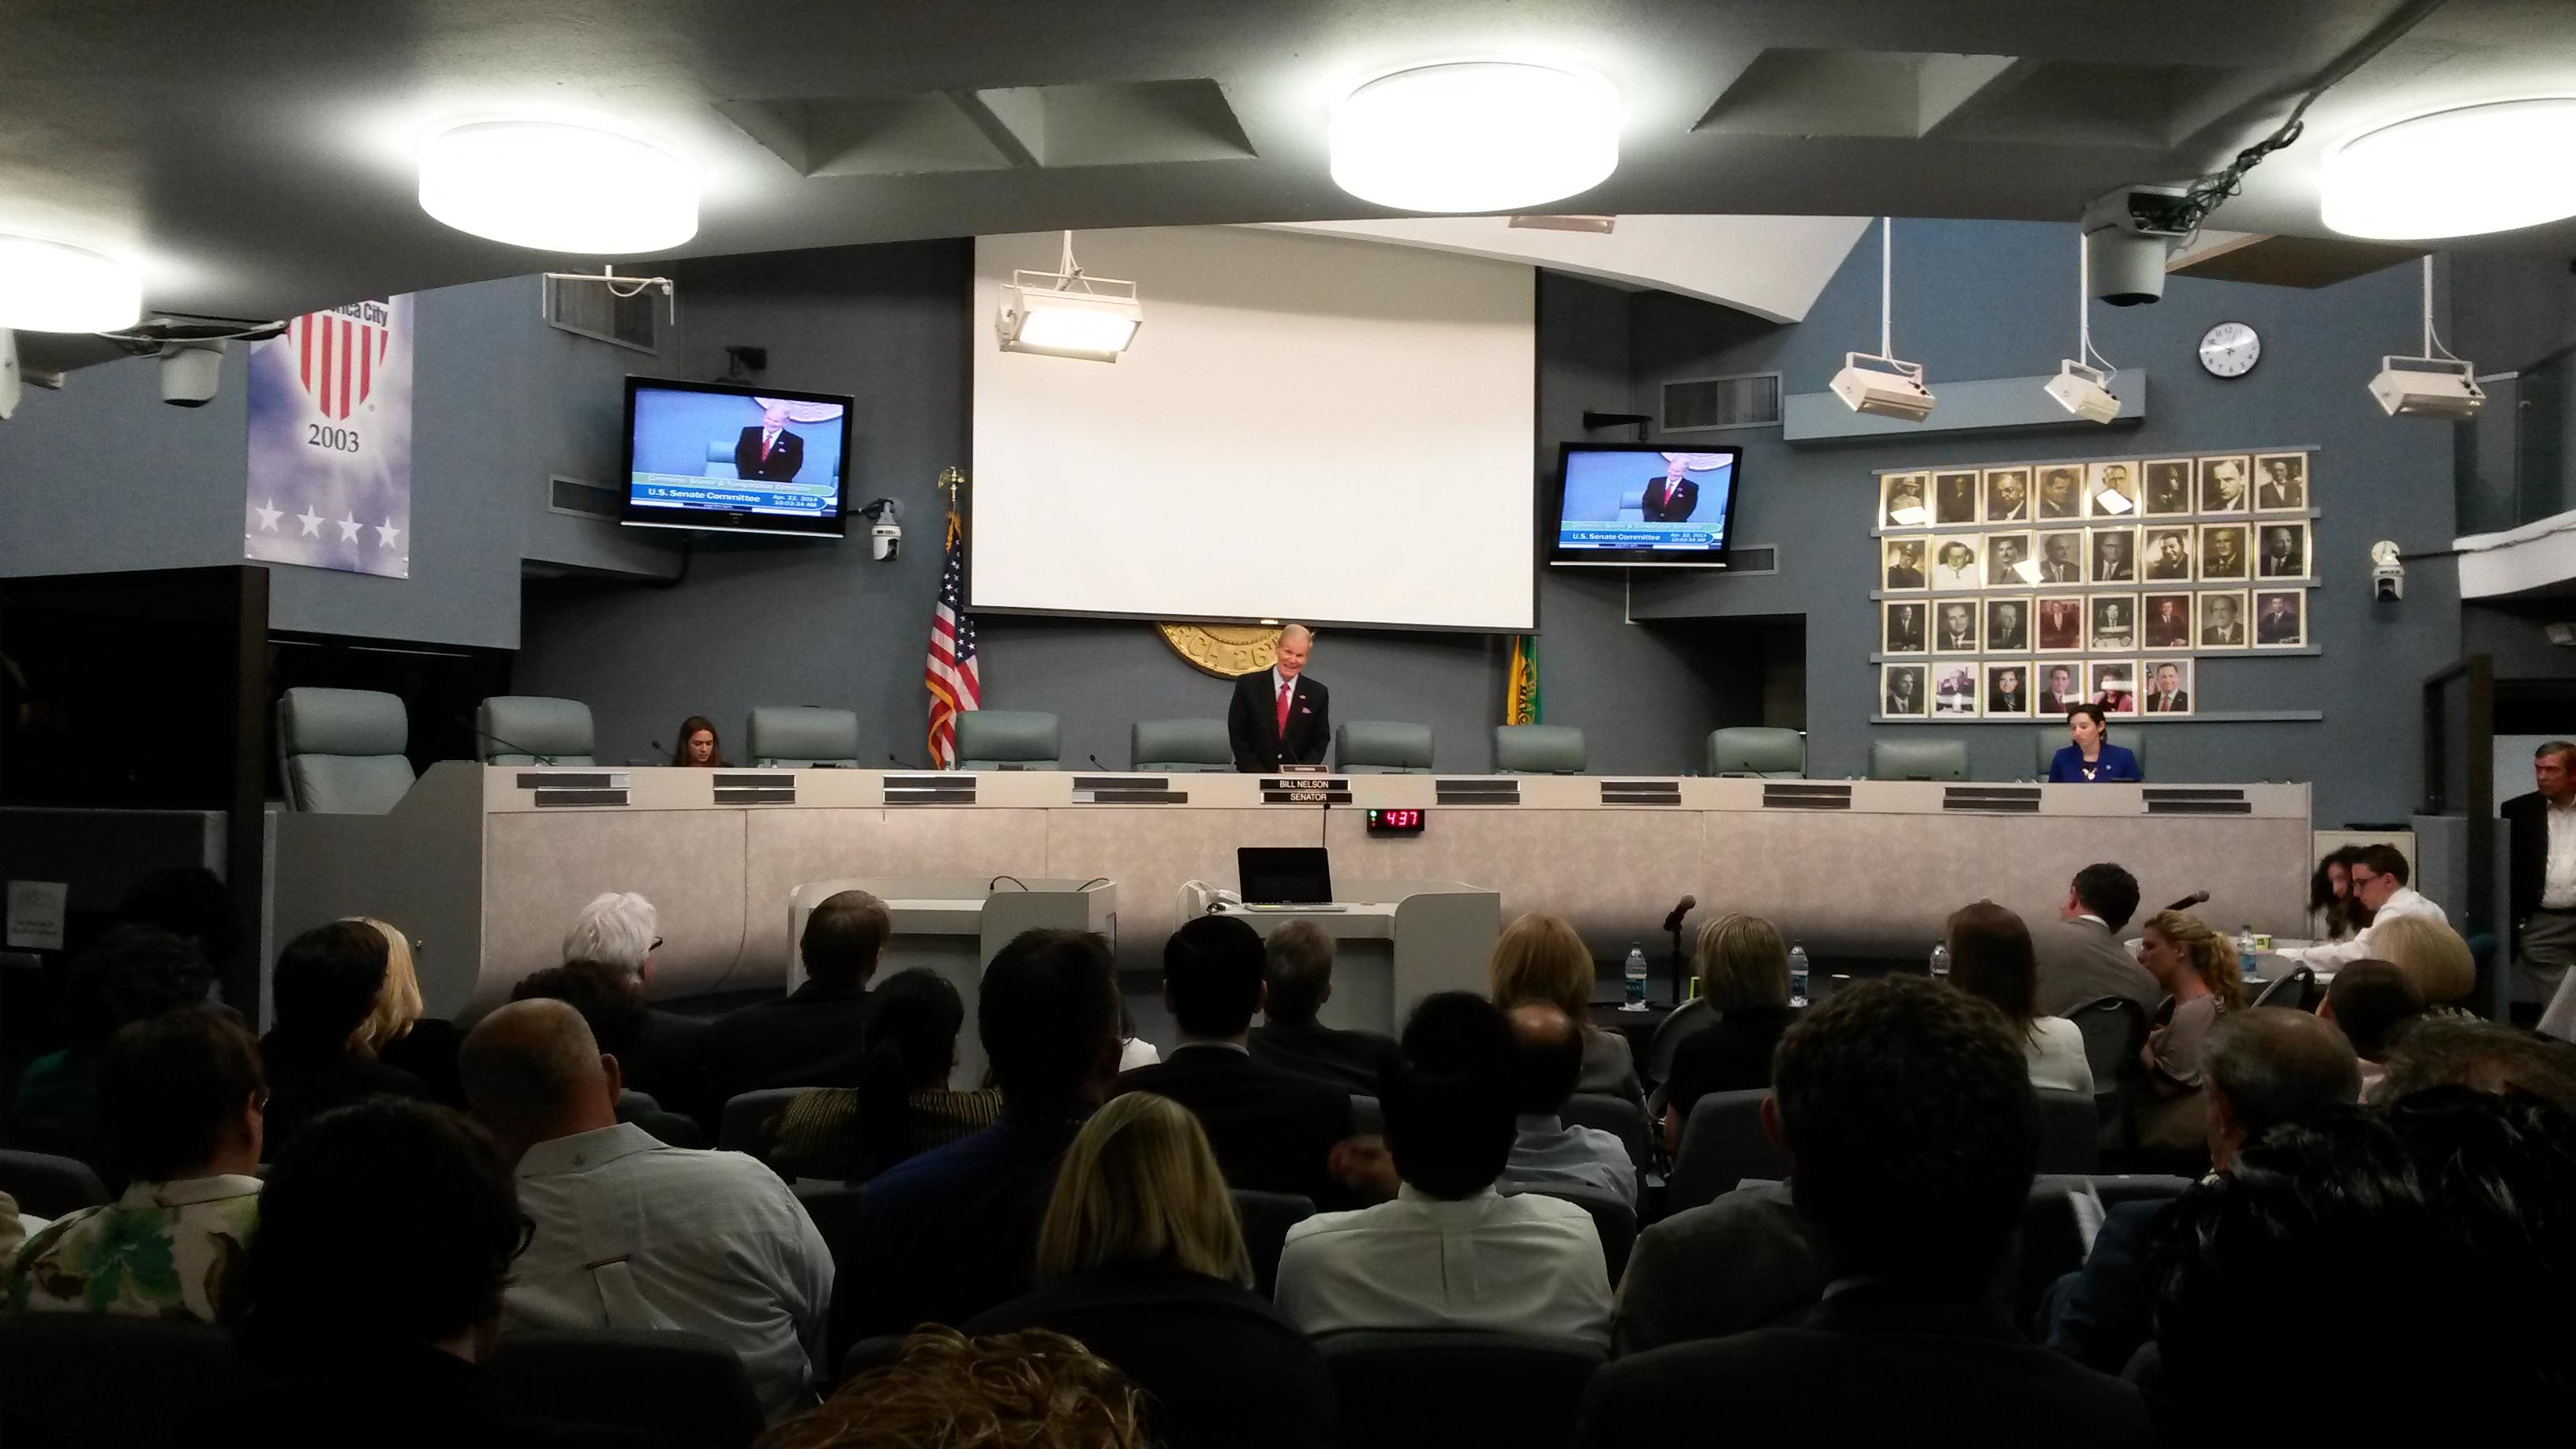 <p>Senator Bill Nelson; Miami, FL. Photo Credit: Rhys Gerholdt/WRI</p>